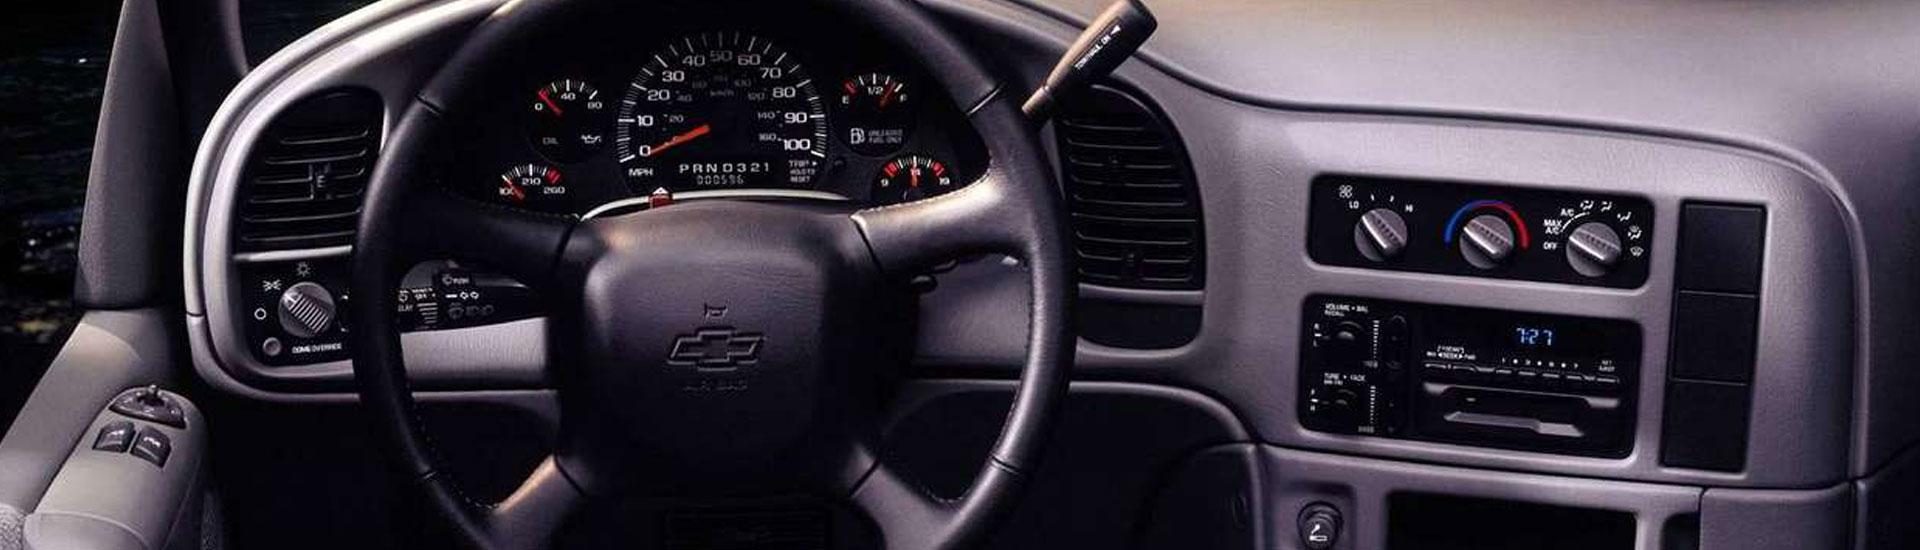 Chevrolet Astro Dash Kits Custom Chevrolet Astro Dash Kit